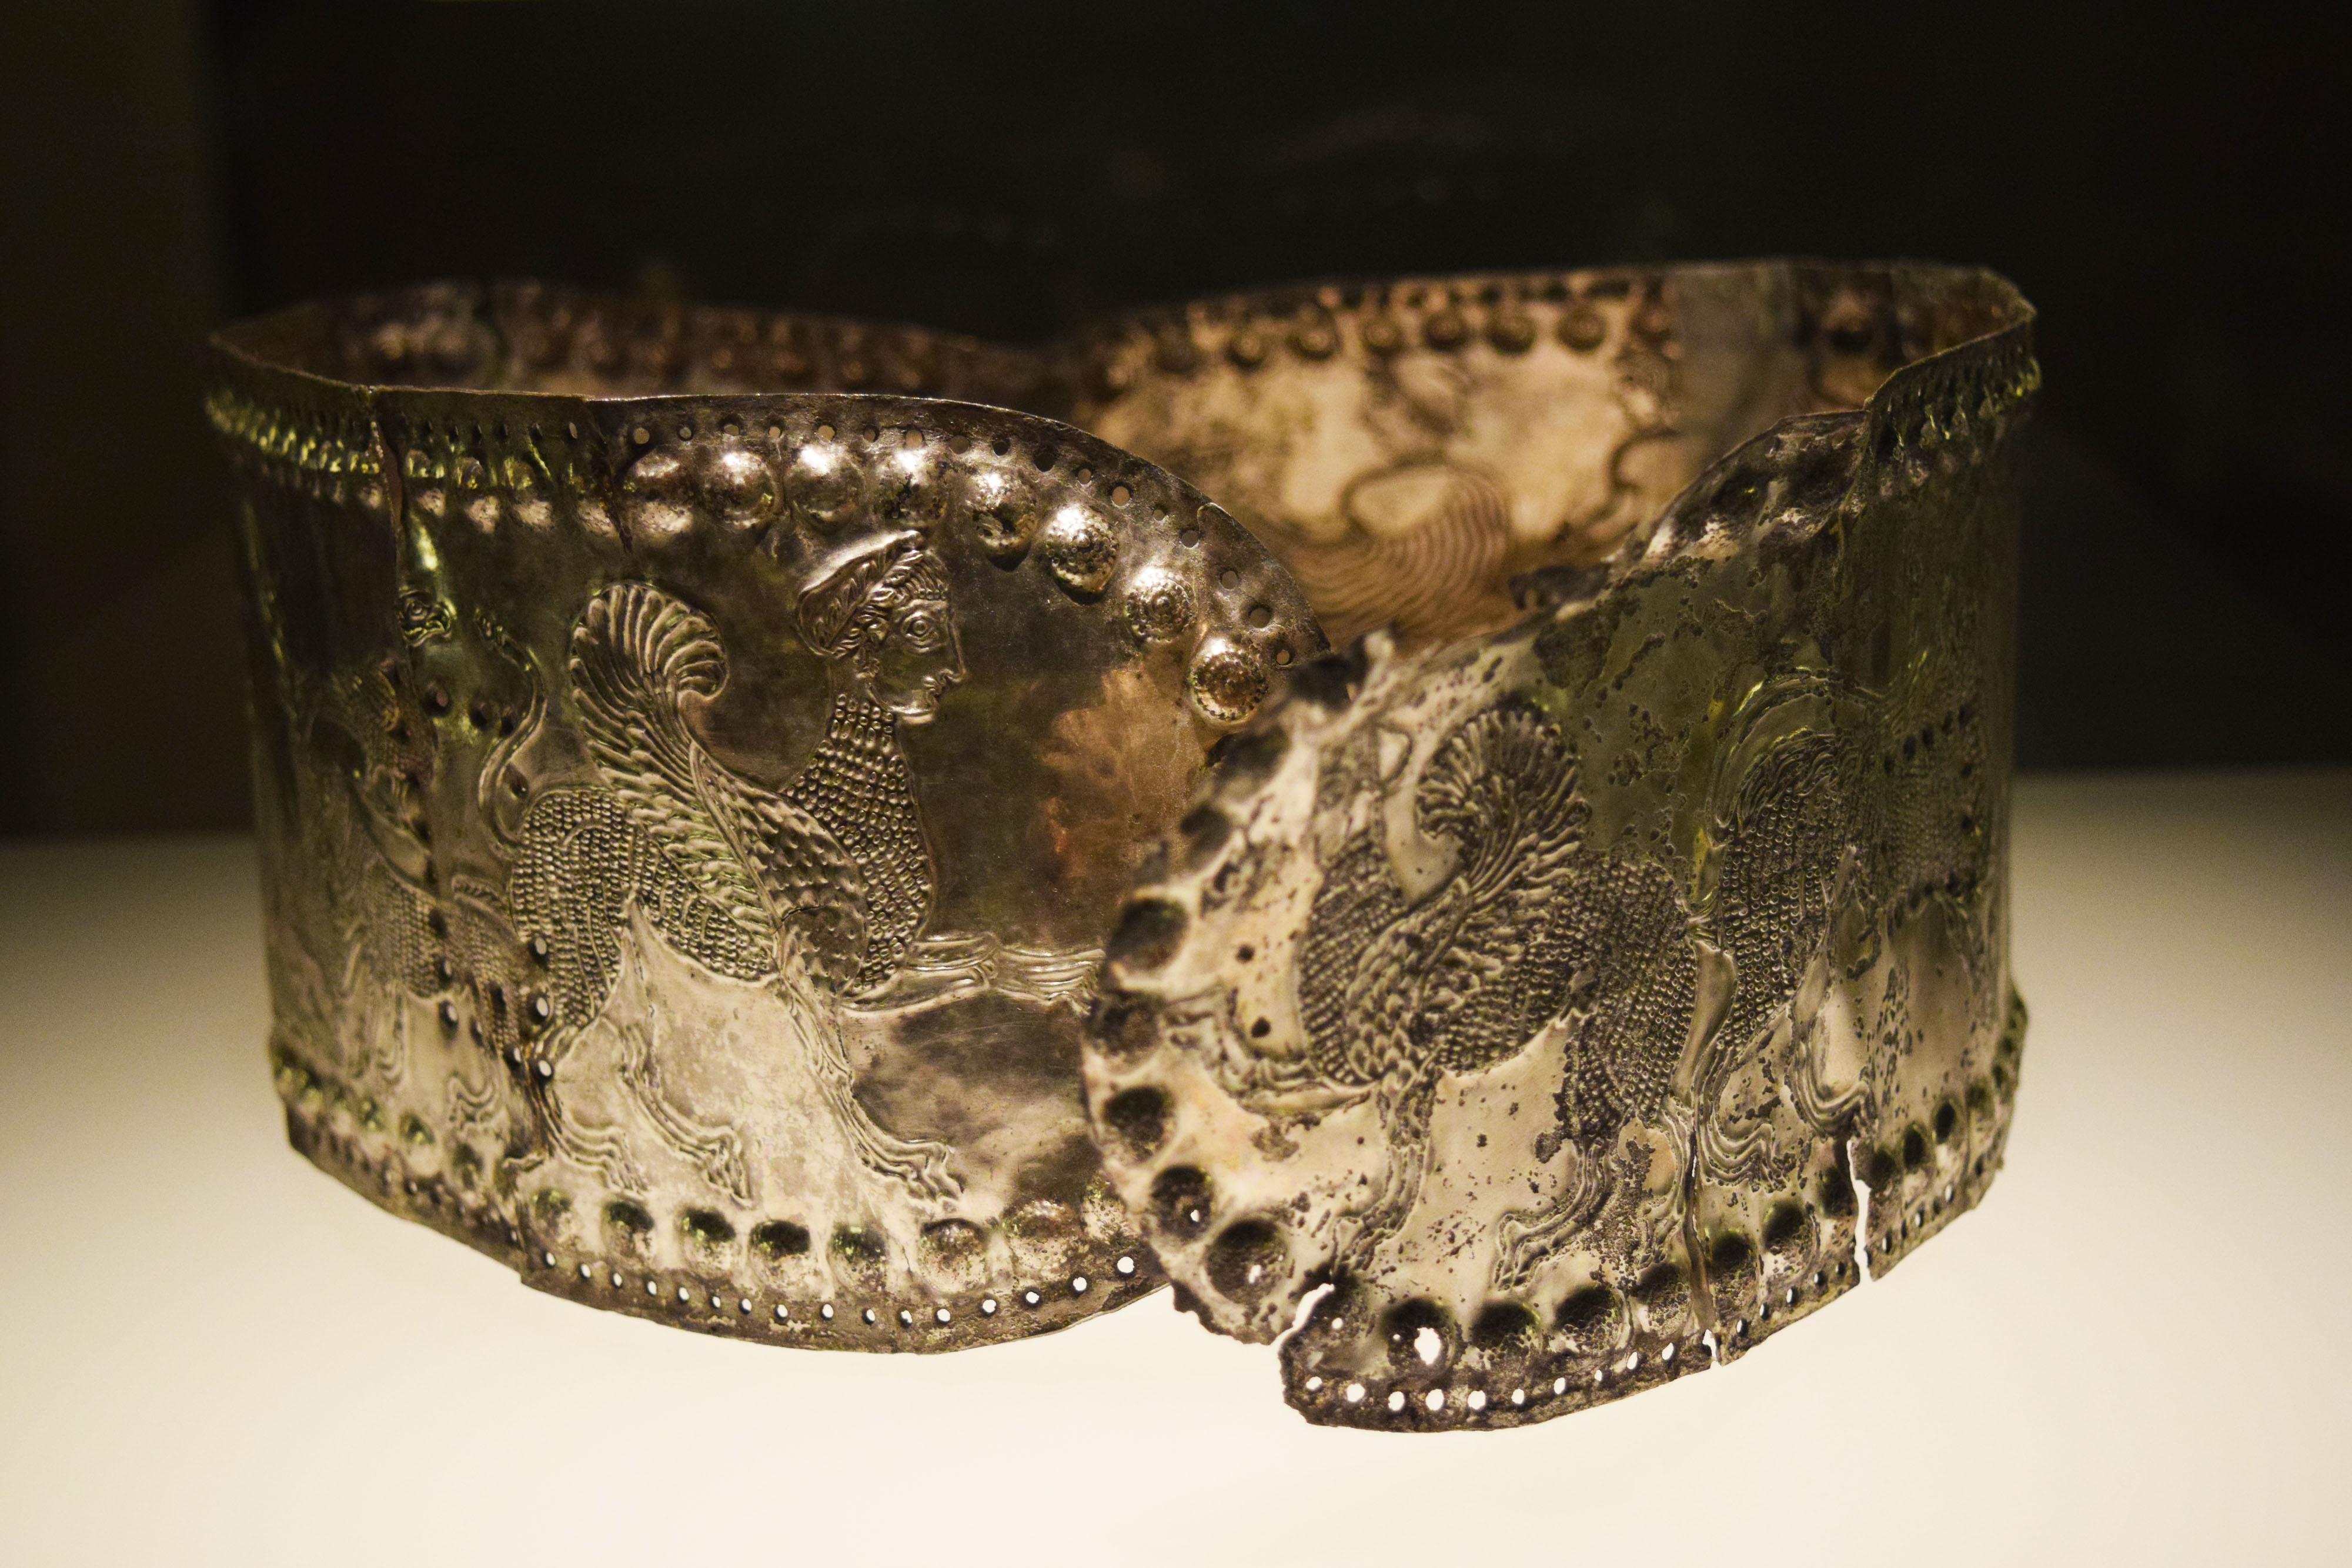 Ibn Muljam's Belt